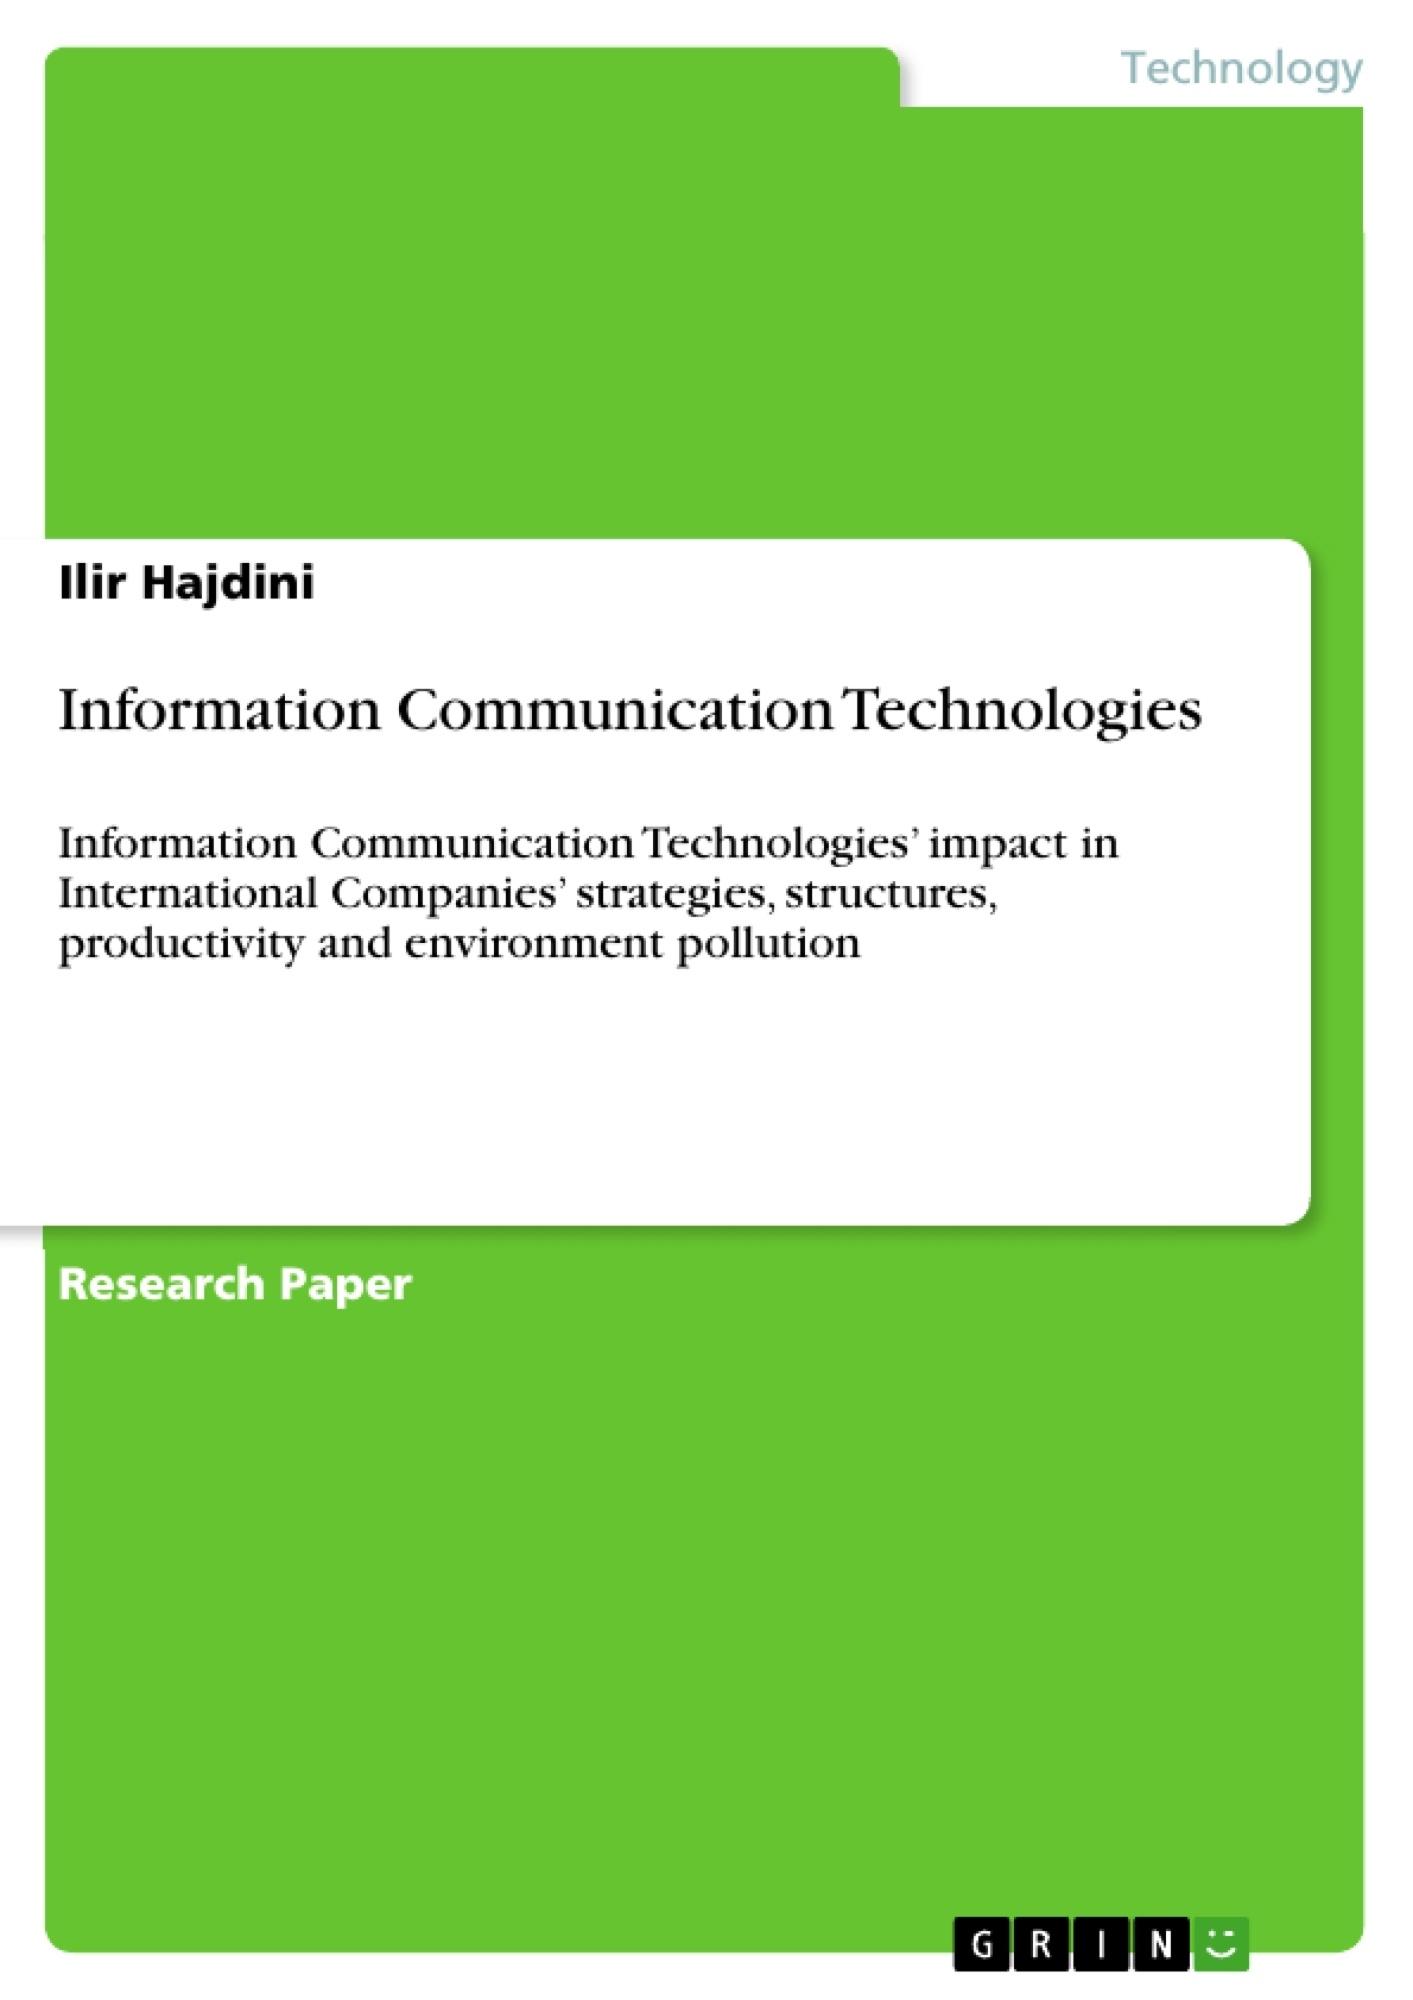 Title: Information Communication Technologies